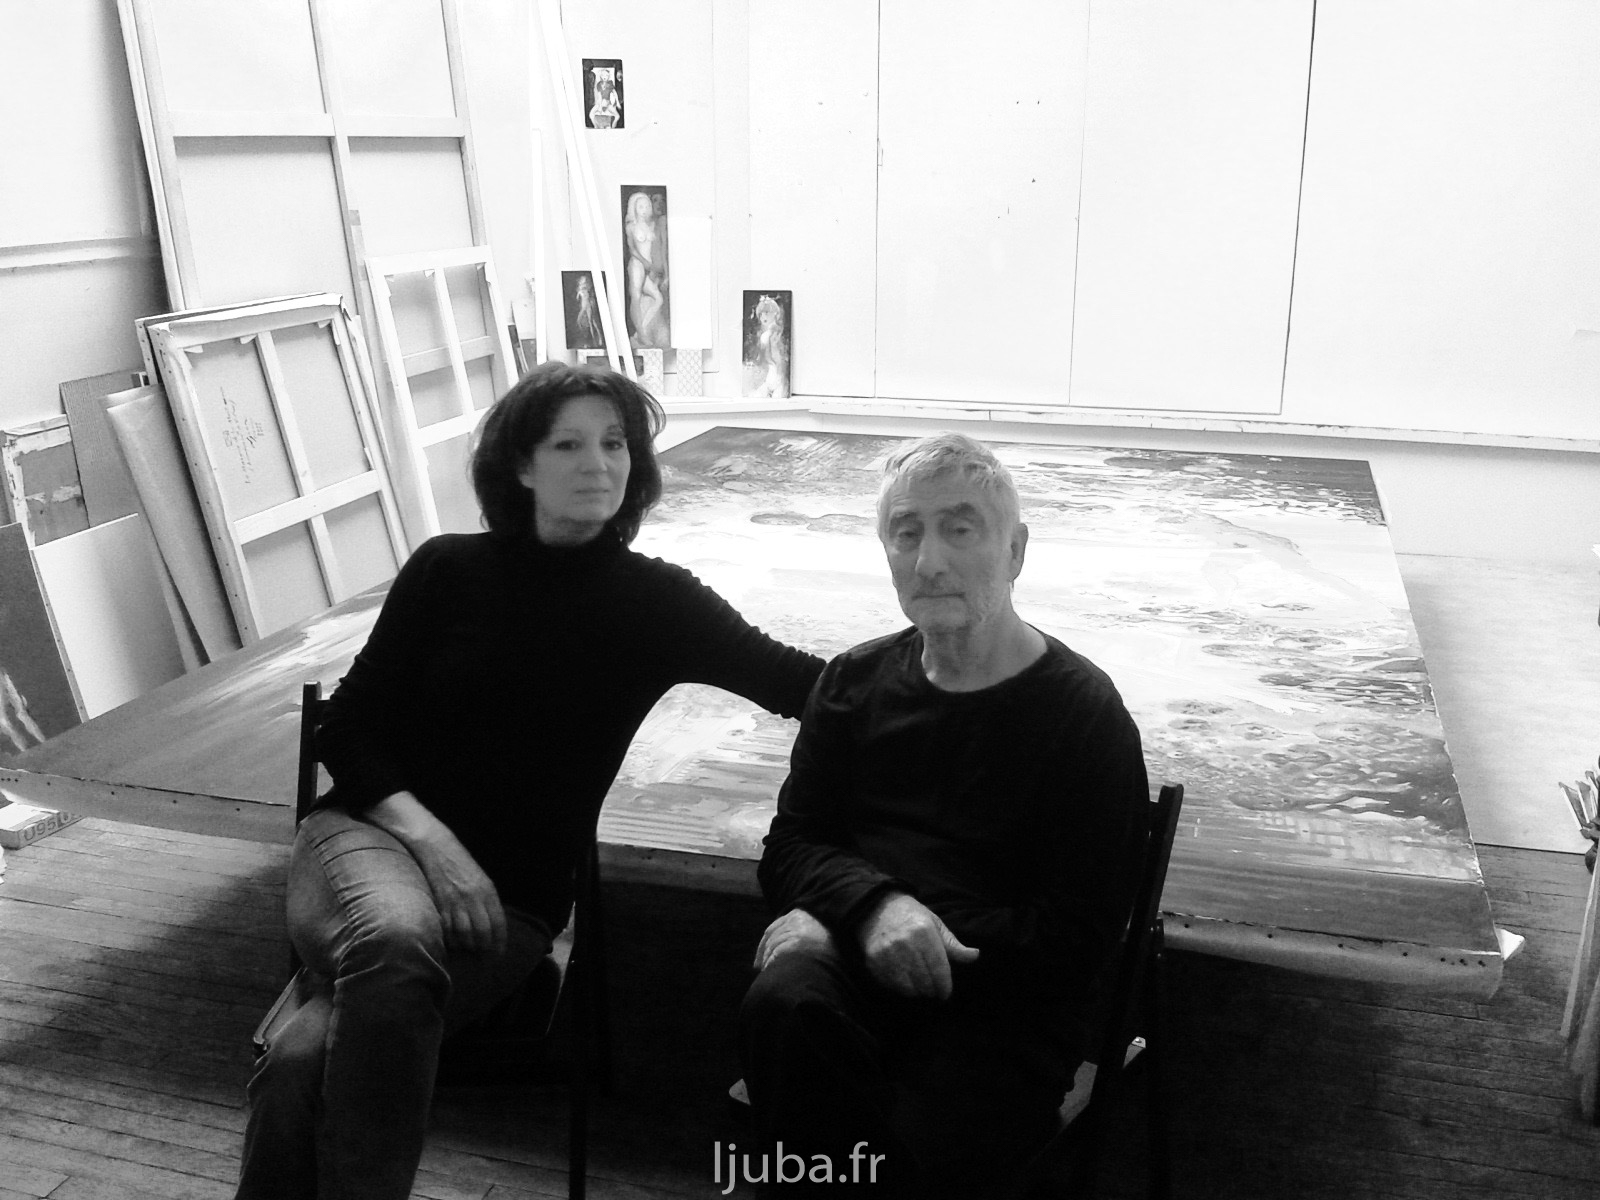 96. 2012., Ljuba i Slavica, verniranje velike slike_